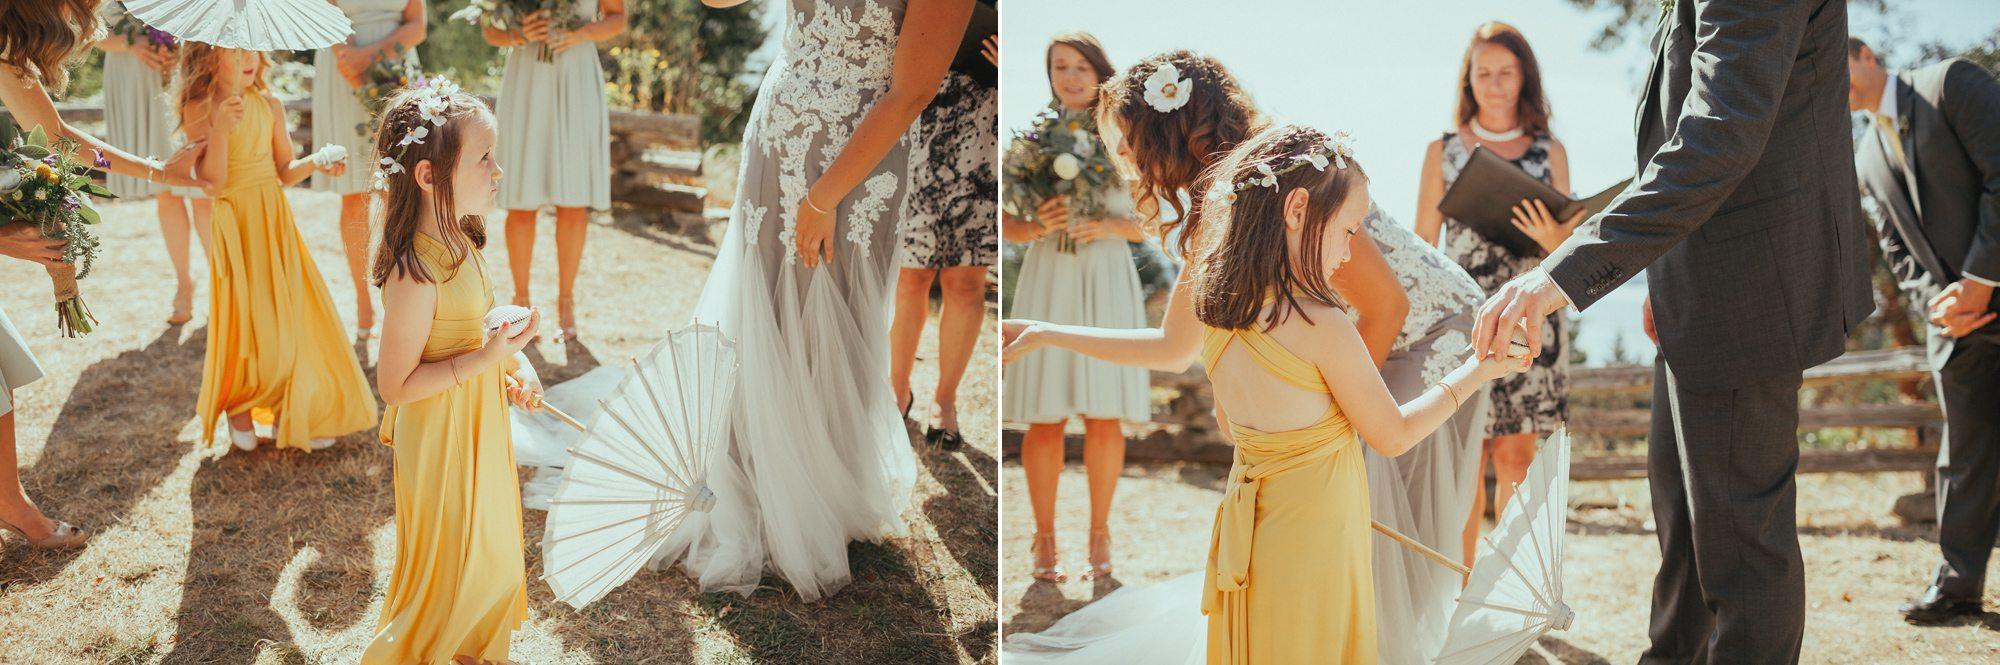 sarah-sal-galiano-wedding-photographer34